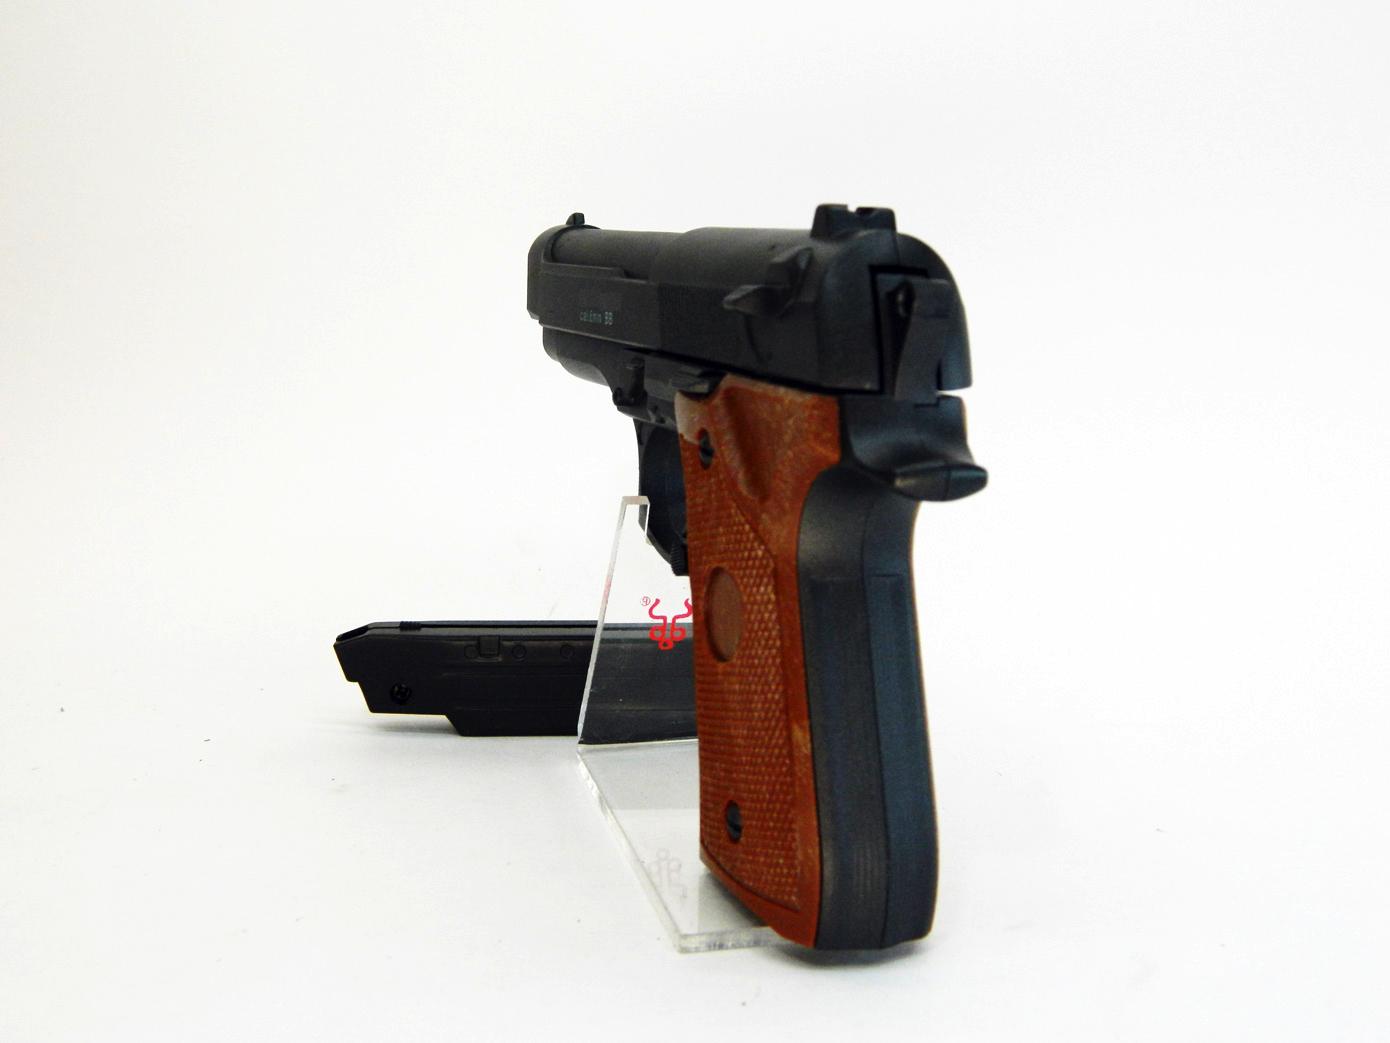 Beretta 92 mini масштаб 1:1 изображение 3